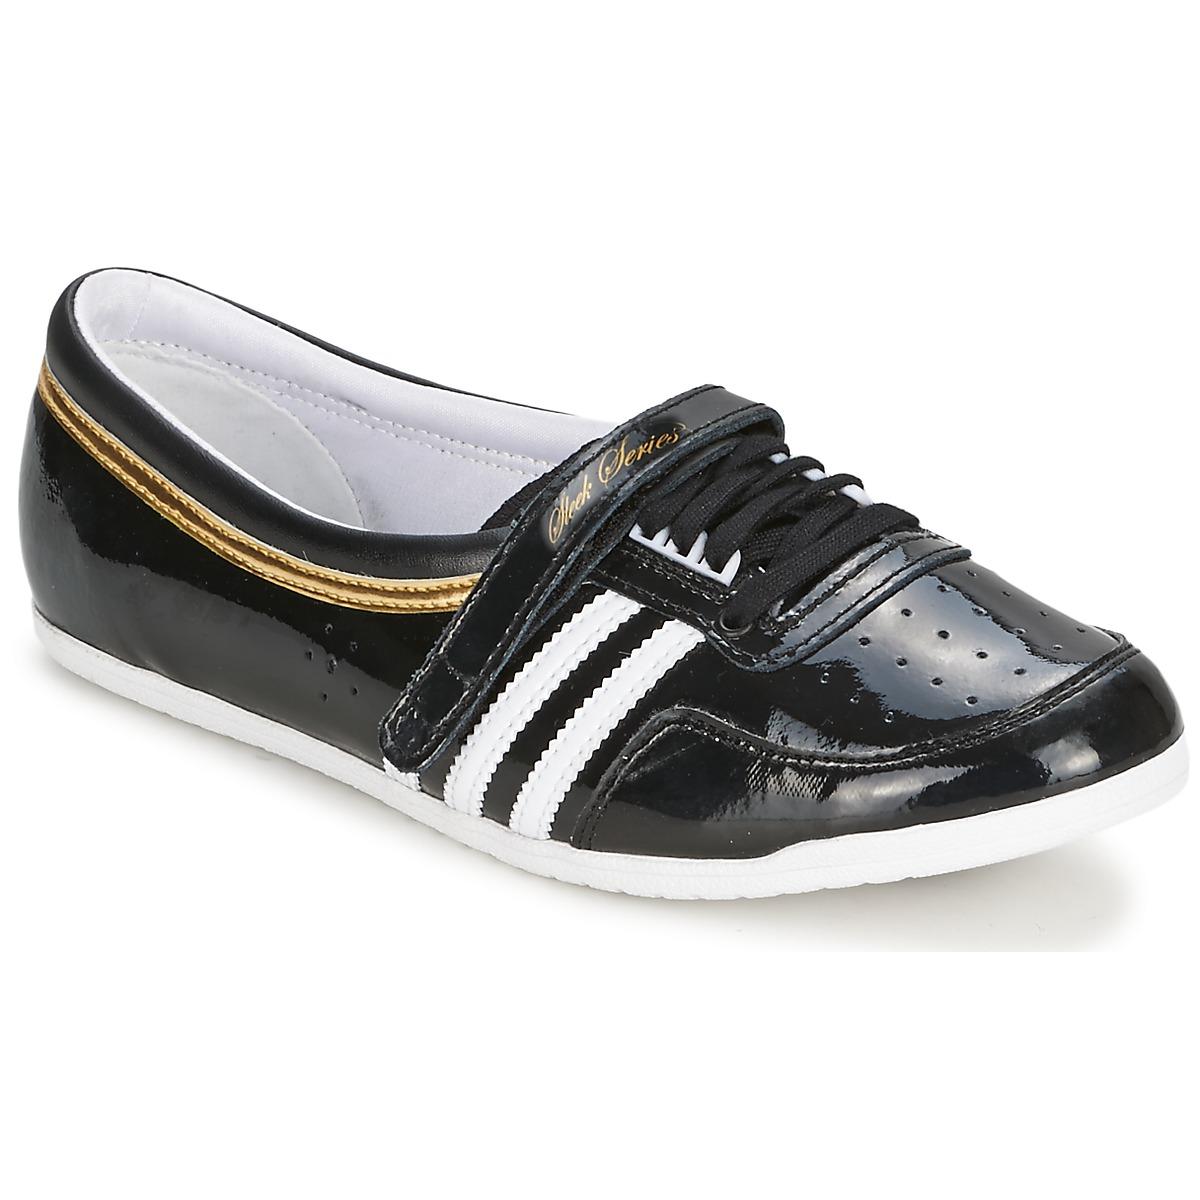 noir Ballerine basket adidas Chaussure lescahiersdalter femme 77YPOtq 724763d68c93